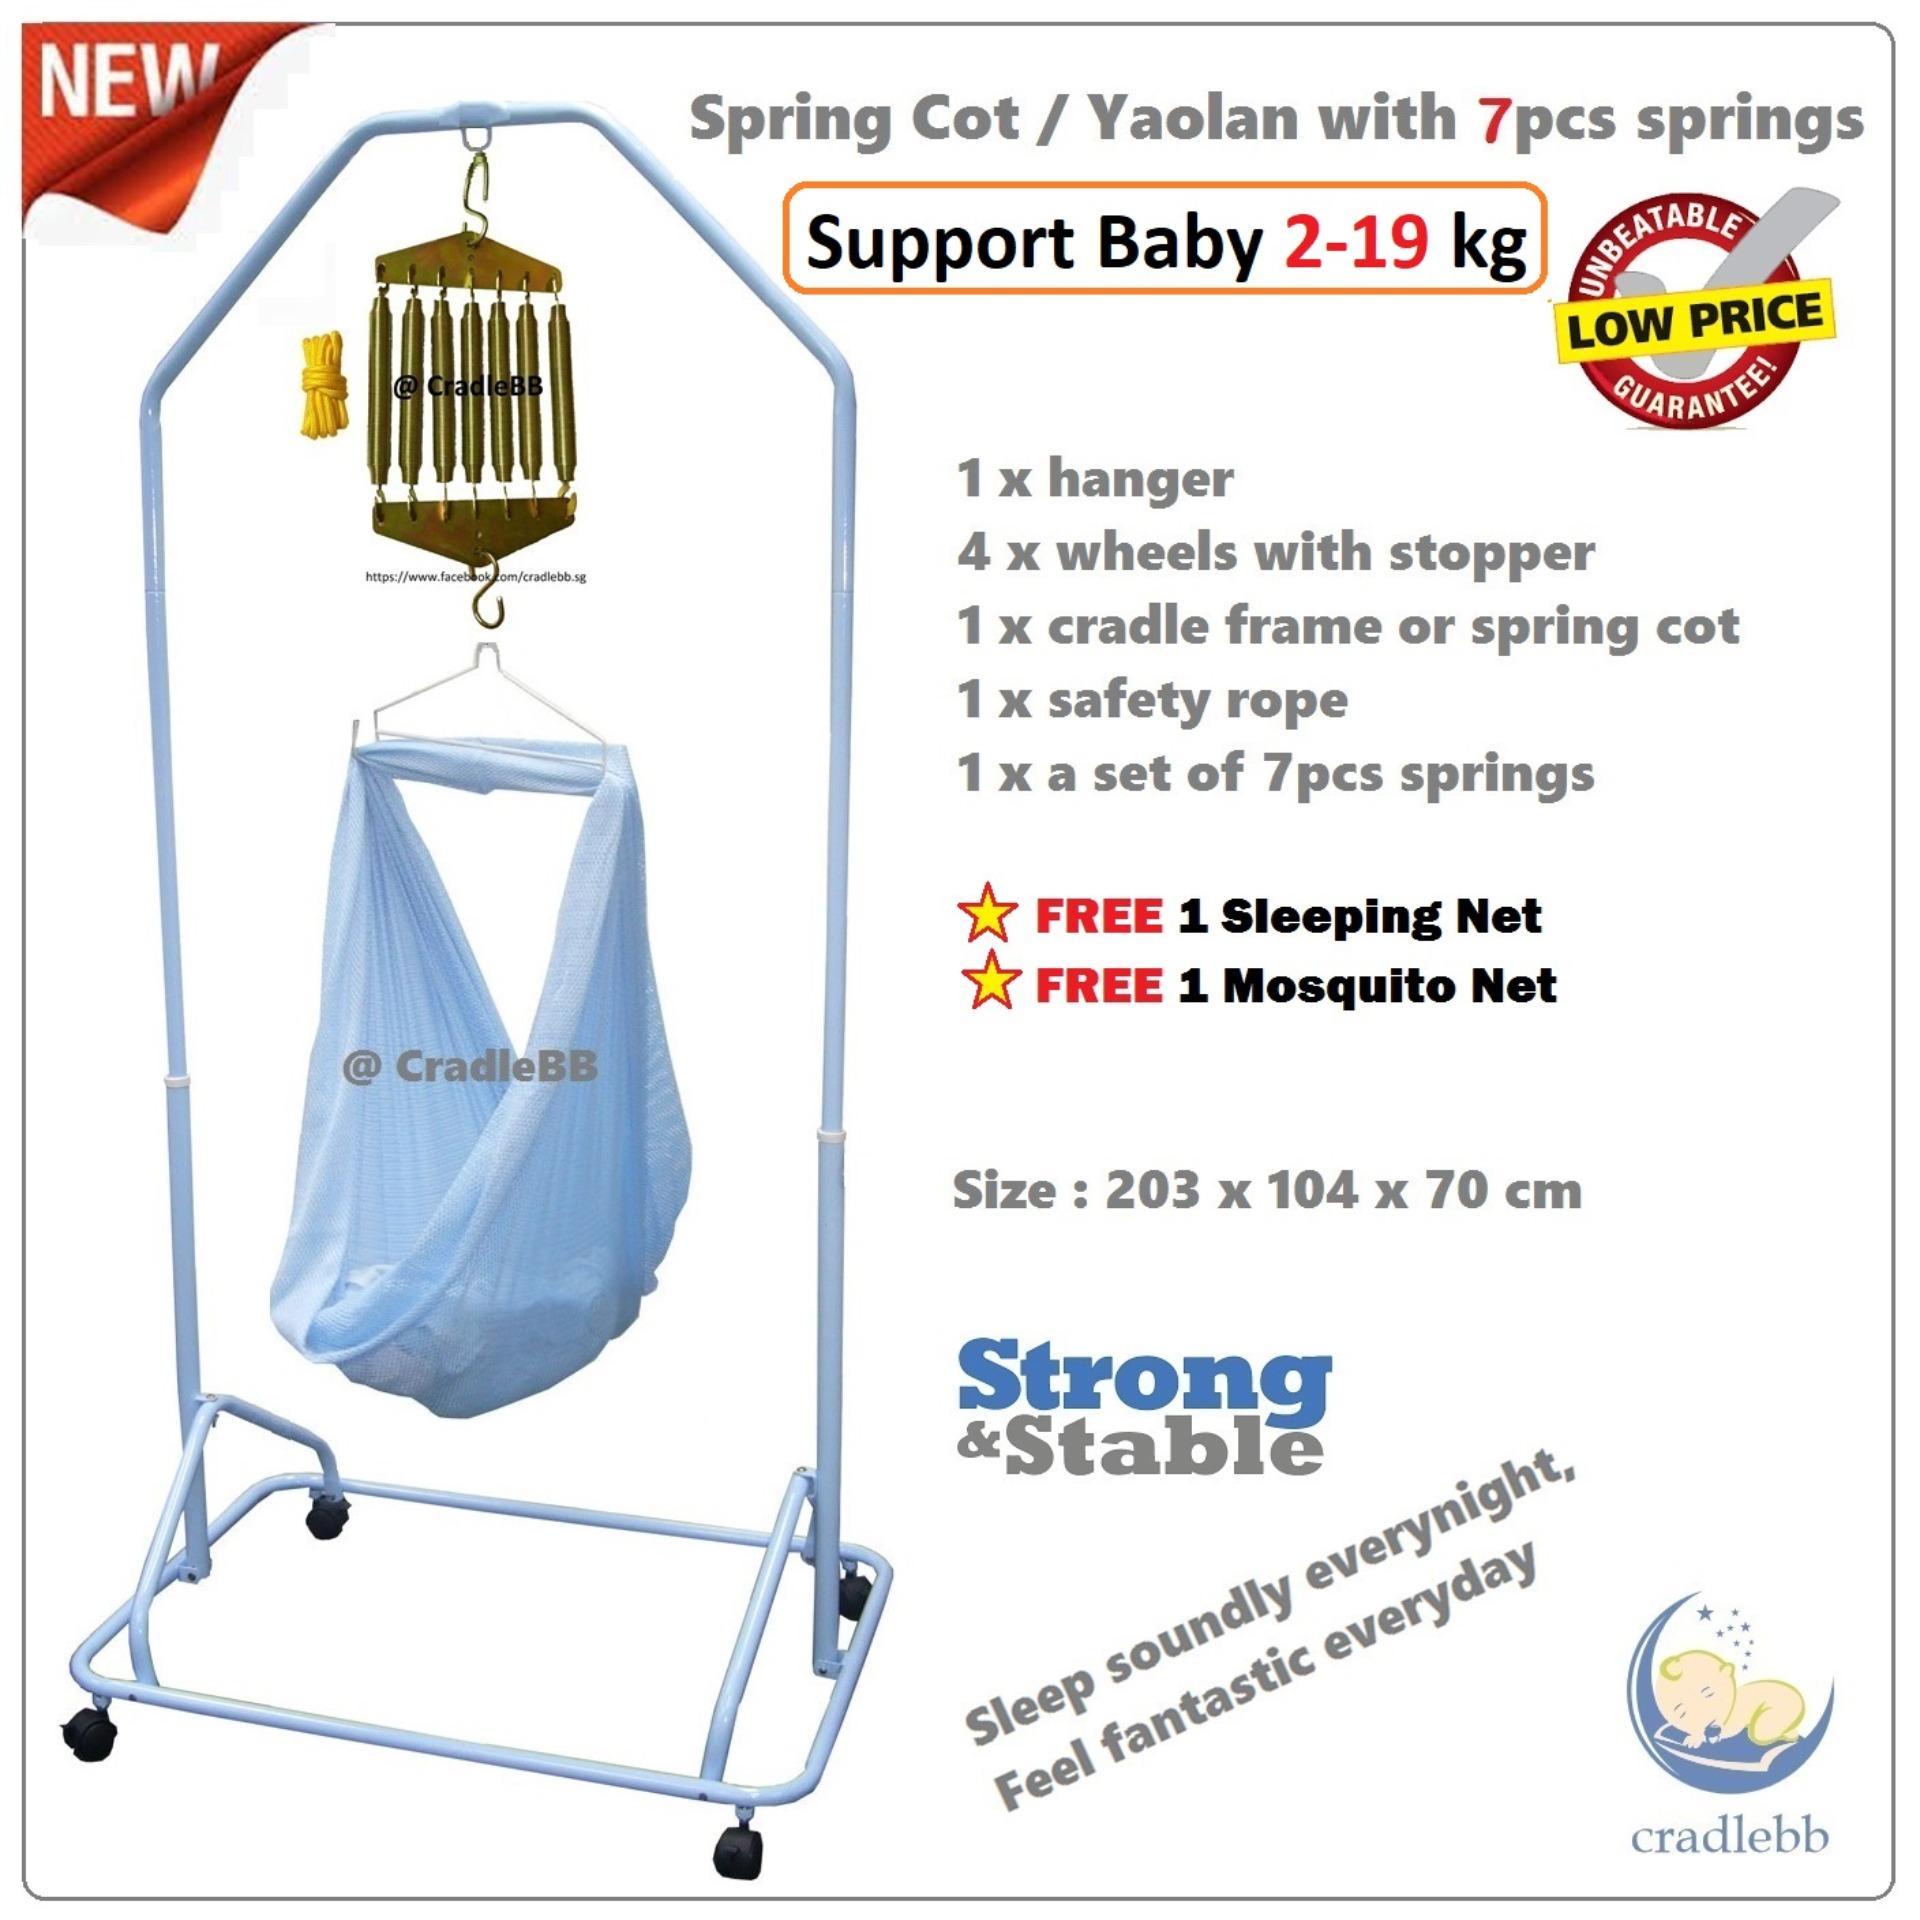 Compare Price Spring Cot Cradle Yaolan Hammock 7 Pcs Spring Free 1 Net On Singapore